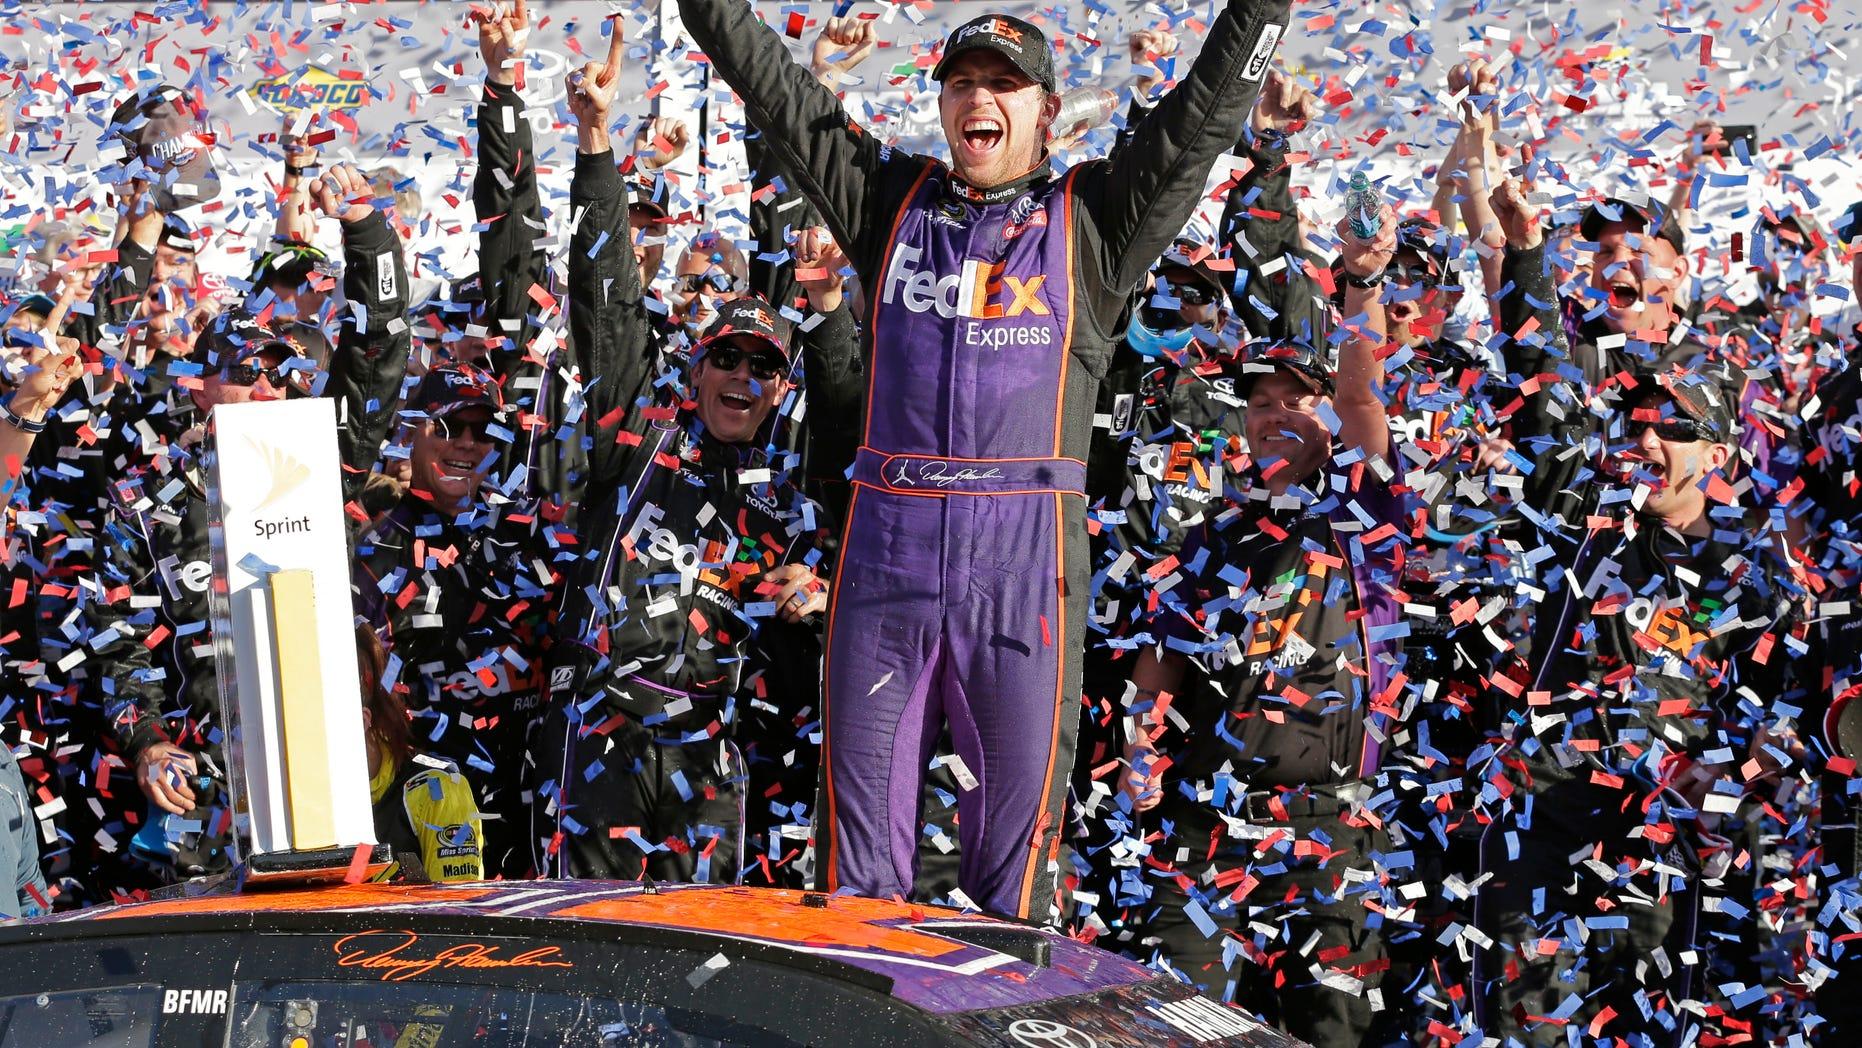 Denny Hamlin celebrates in Victory Lane after winning the NASCAR Daytona 500 Sprint Cup Series auto race.